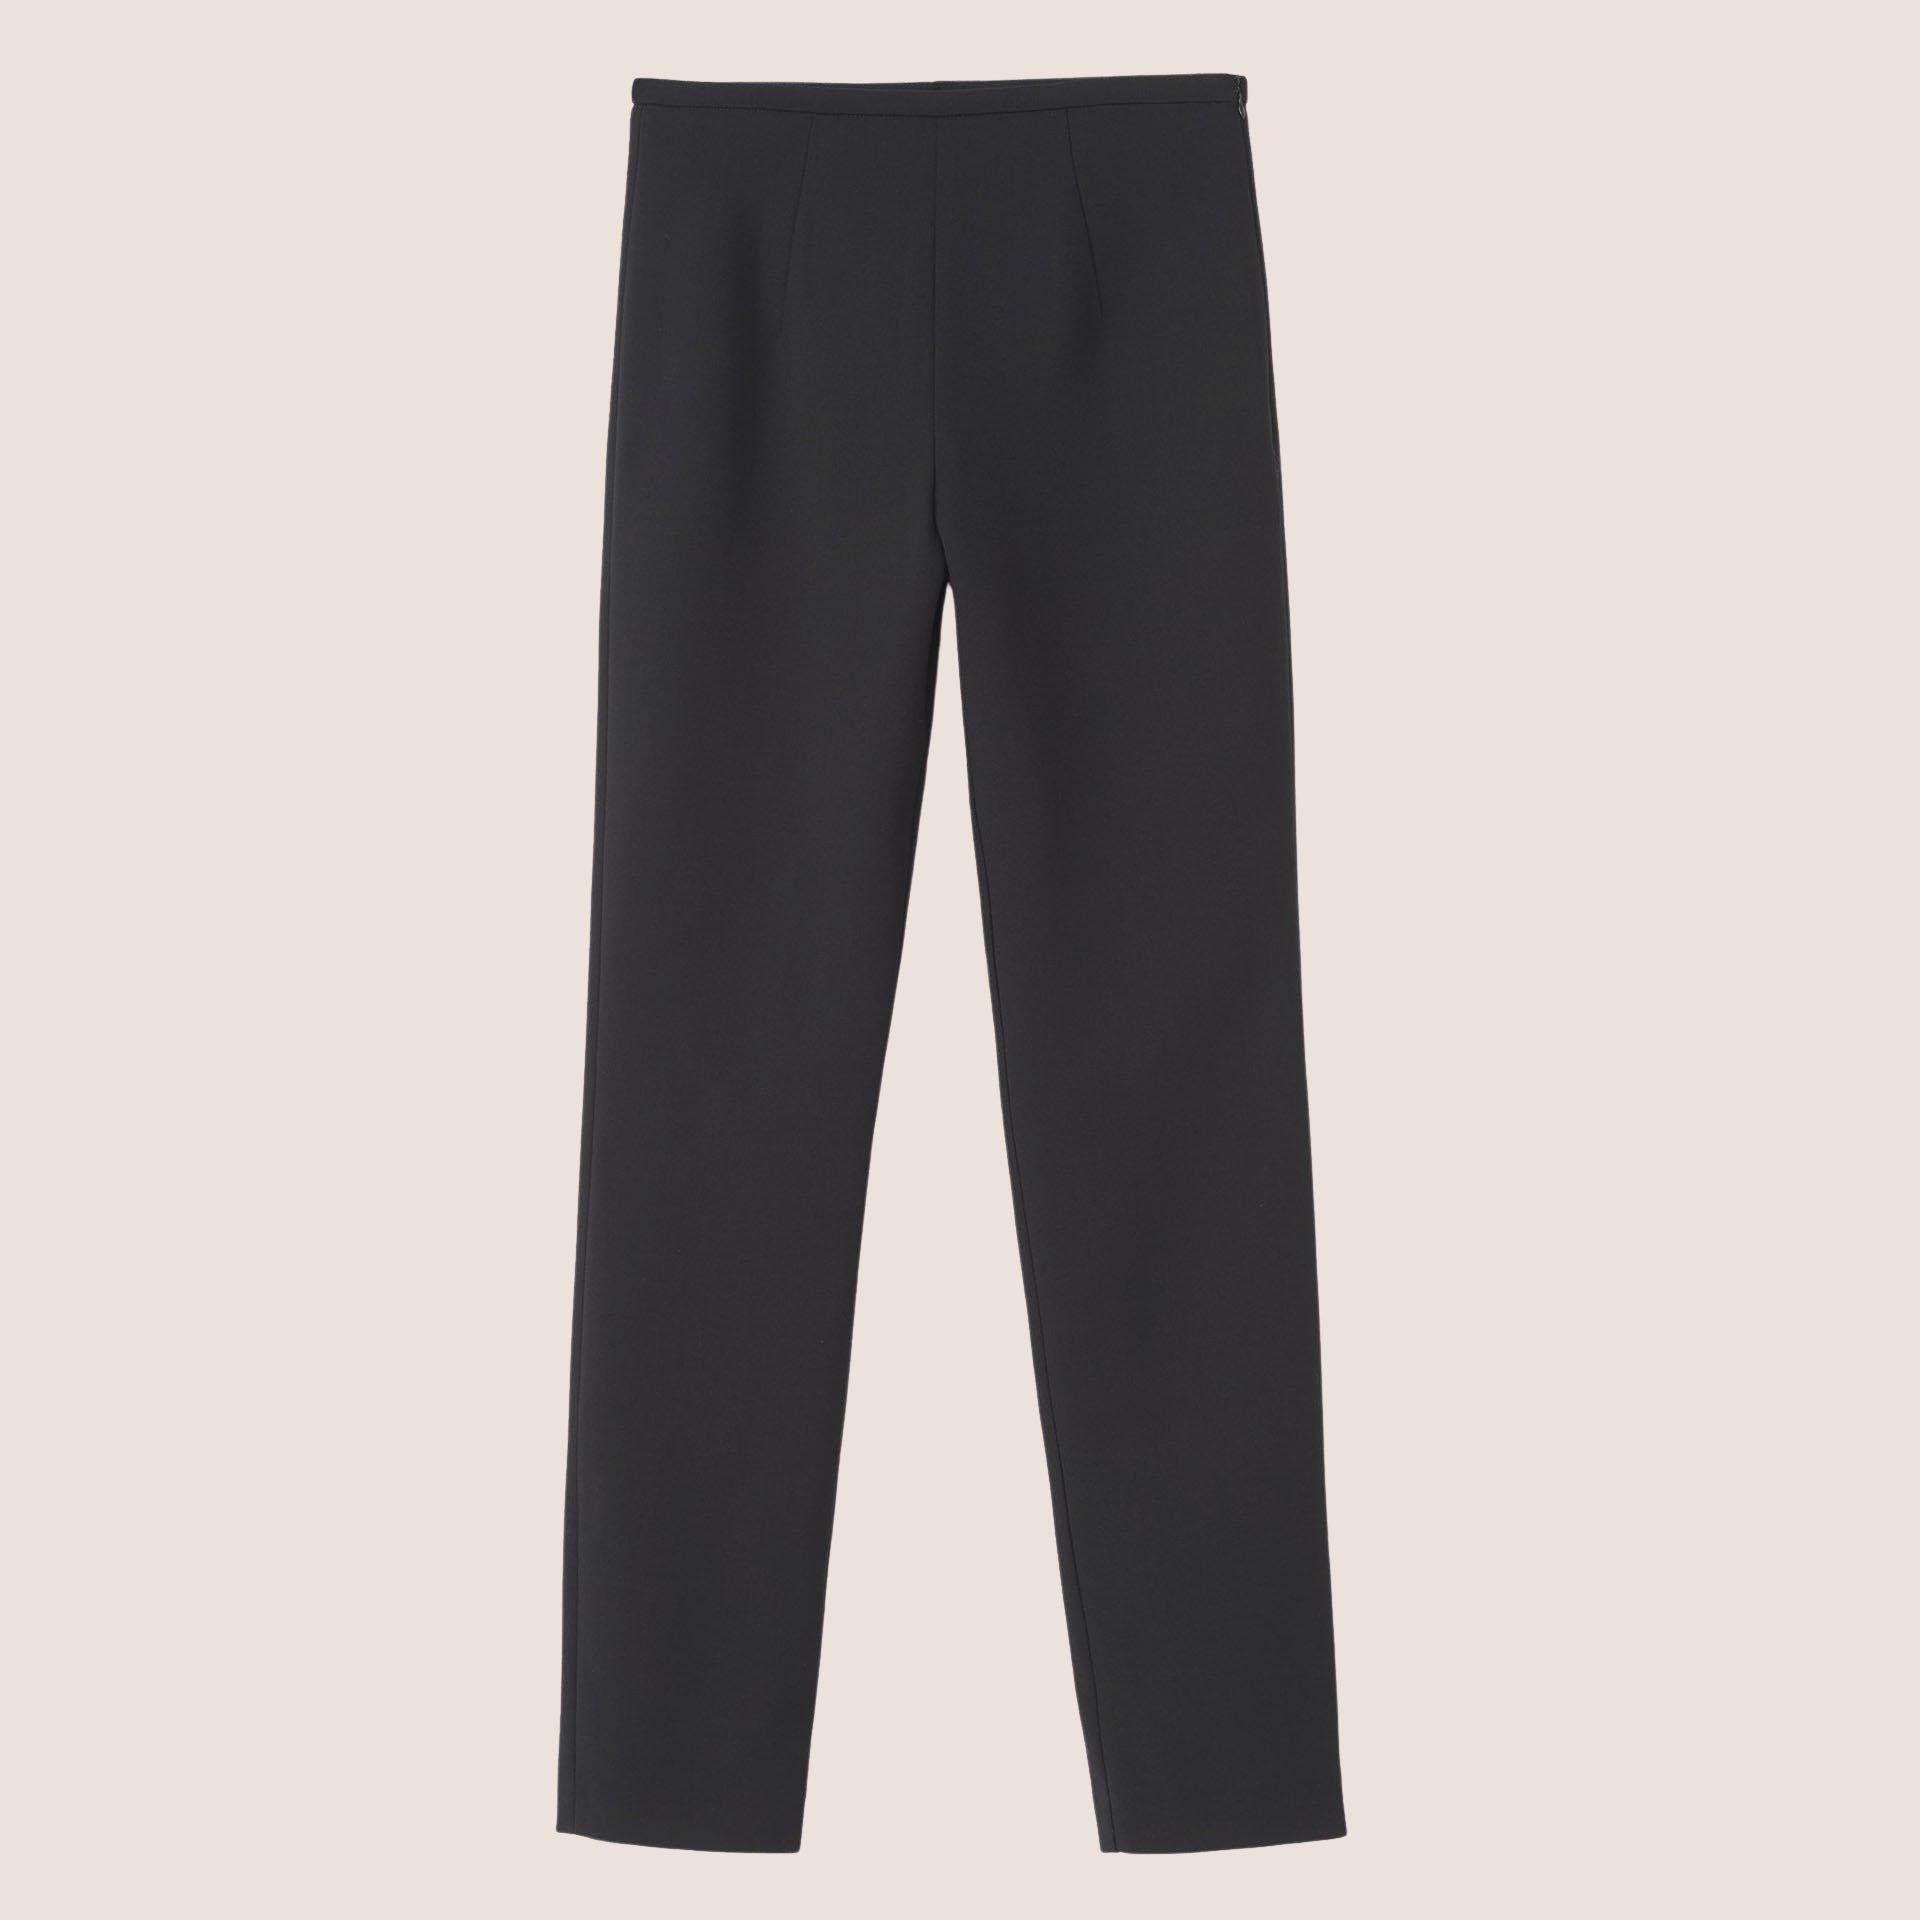 Saze Trousers